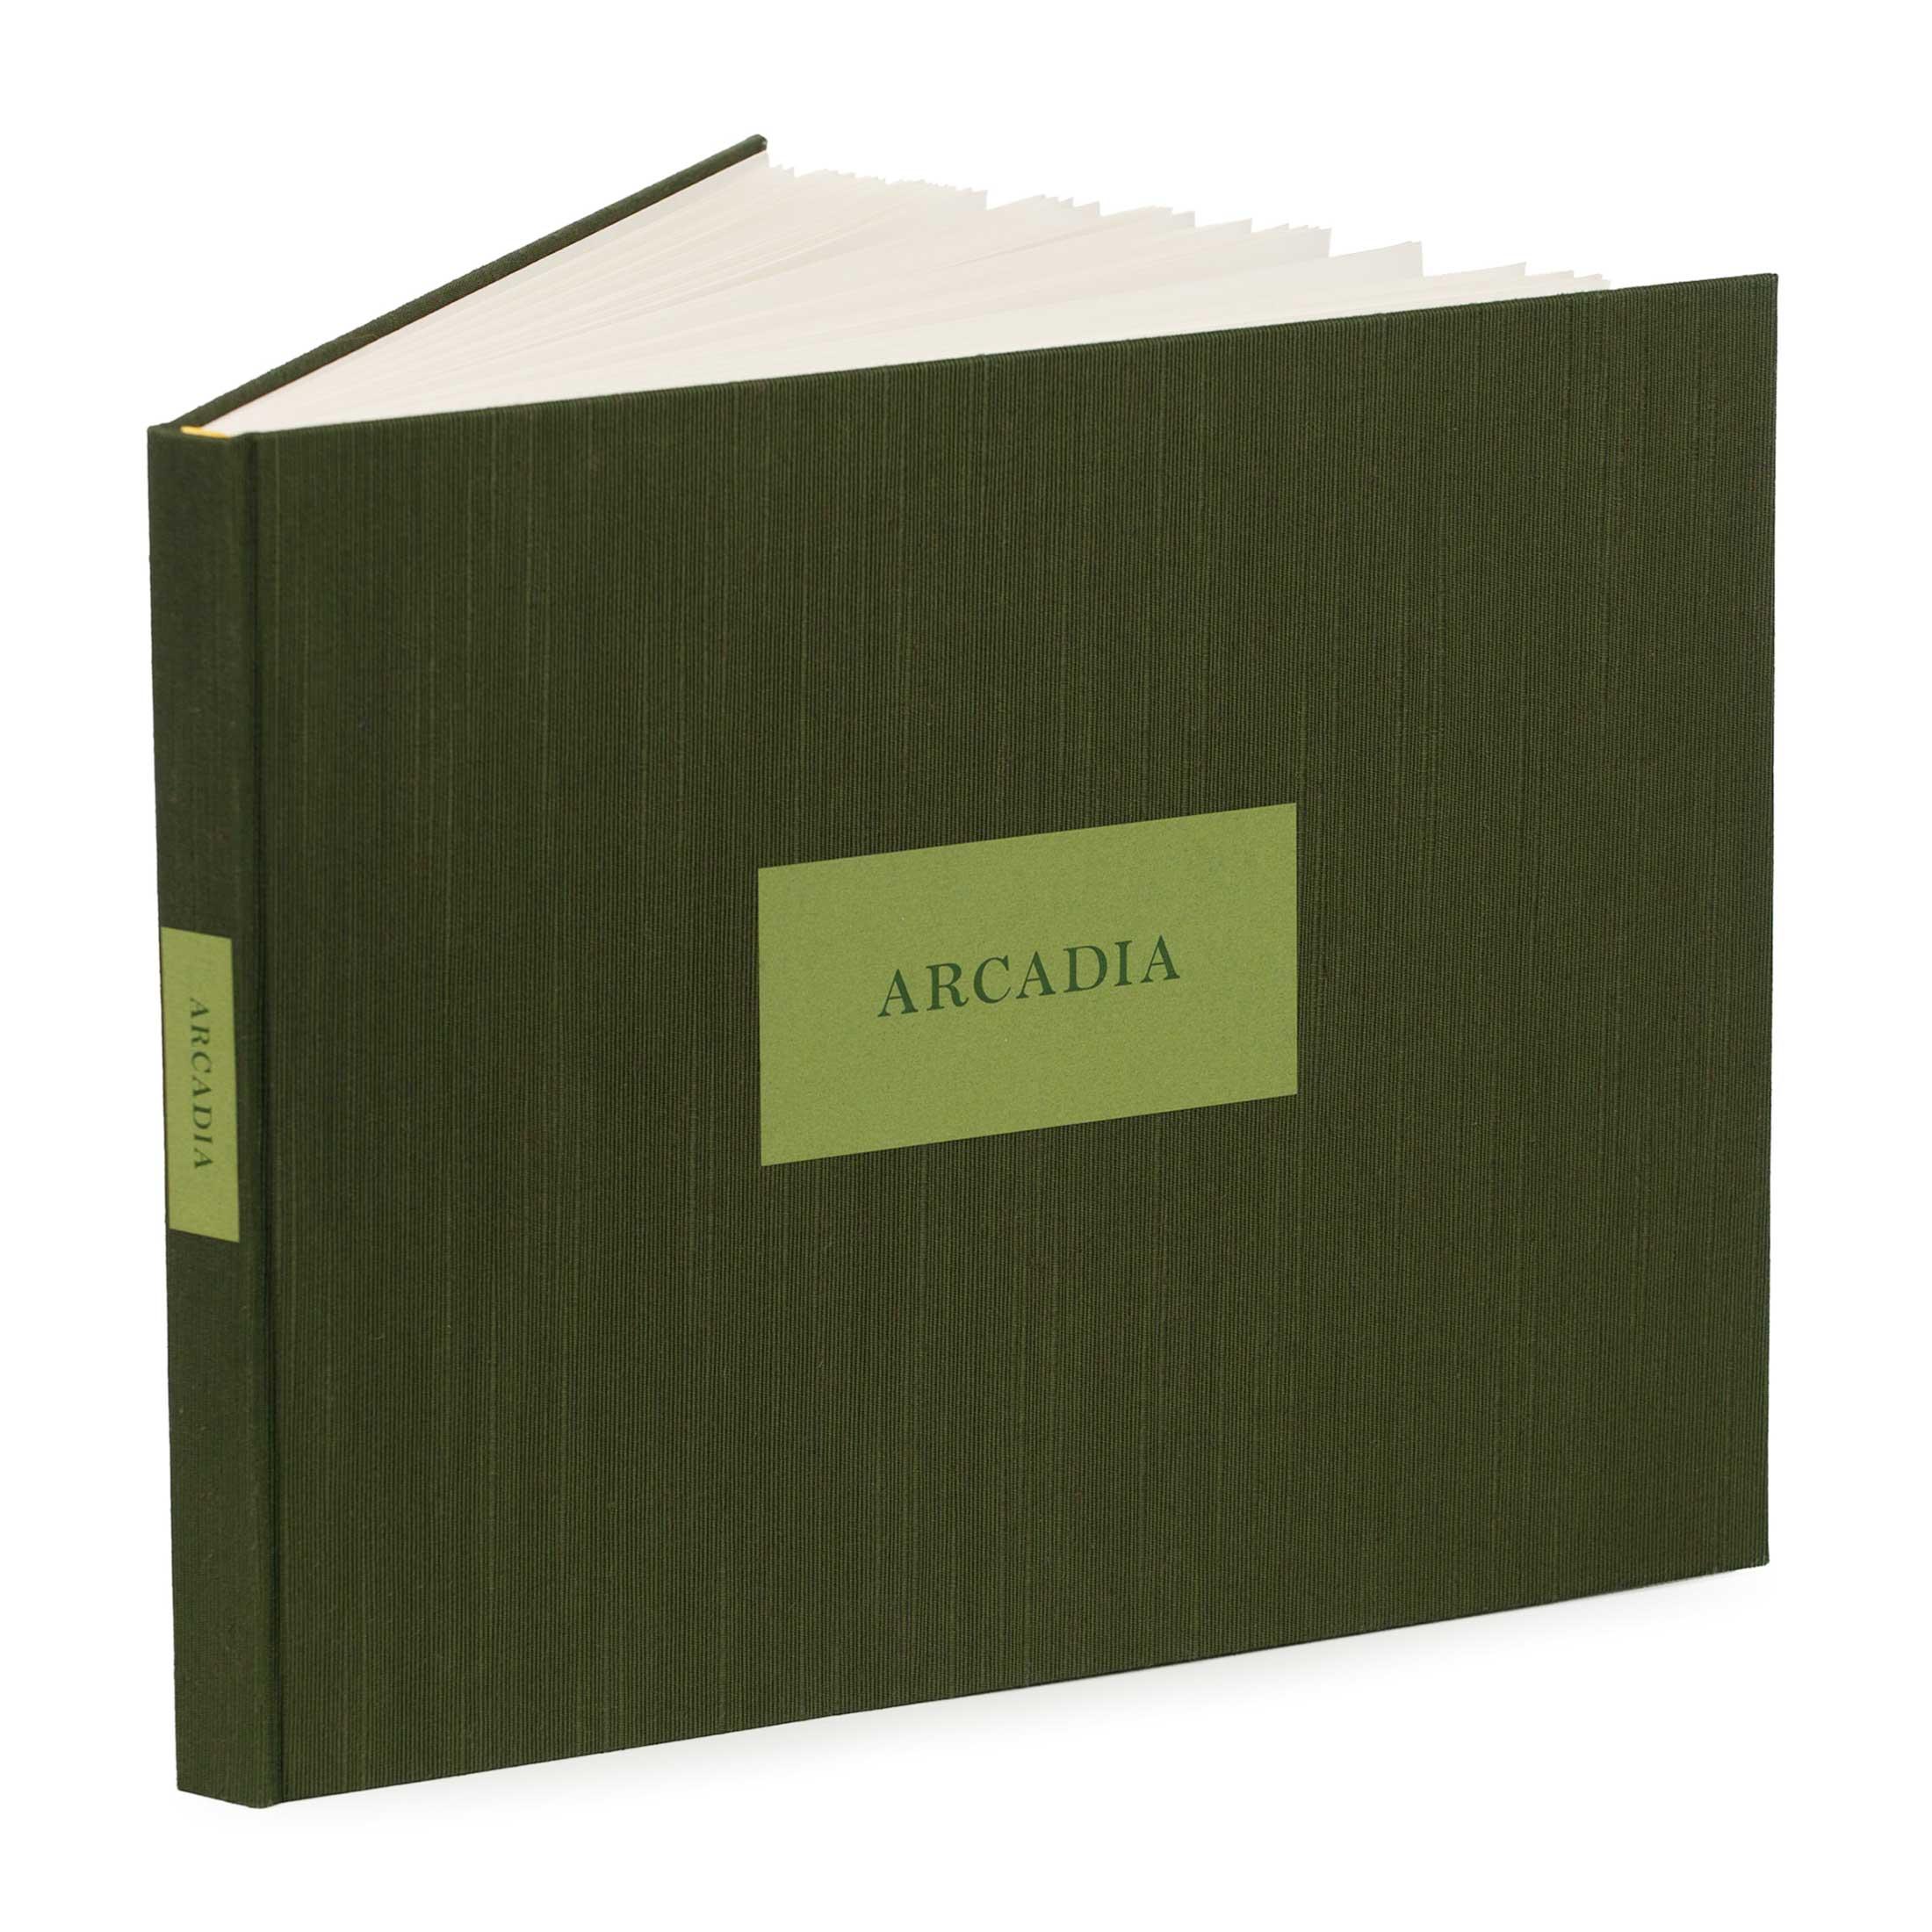 062_Arcadia.HERO-1.jpg